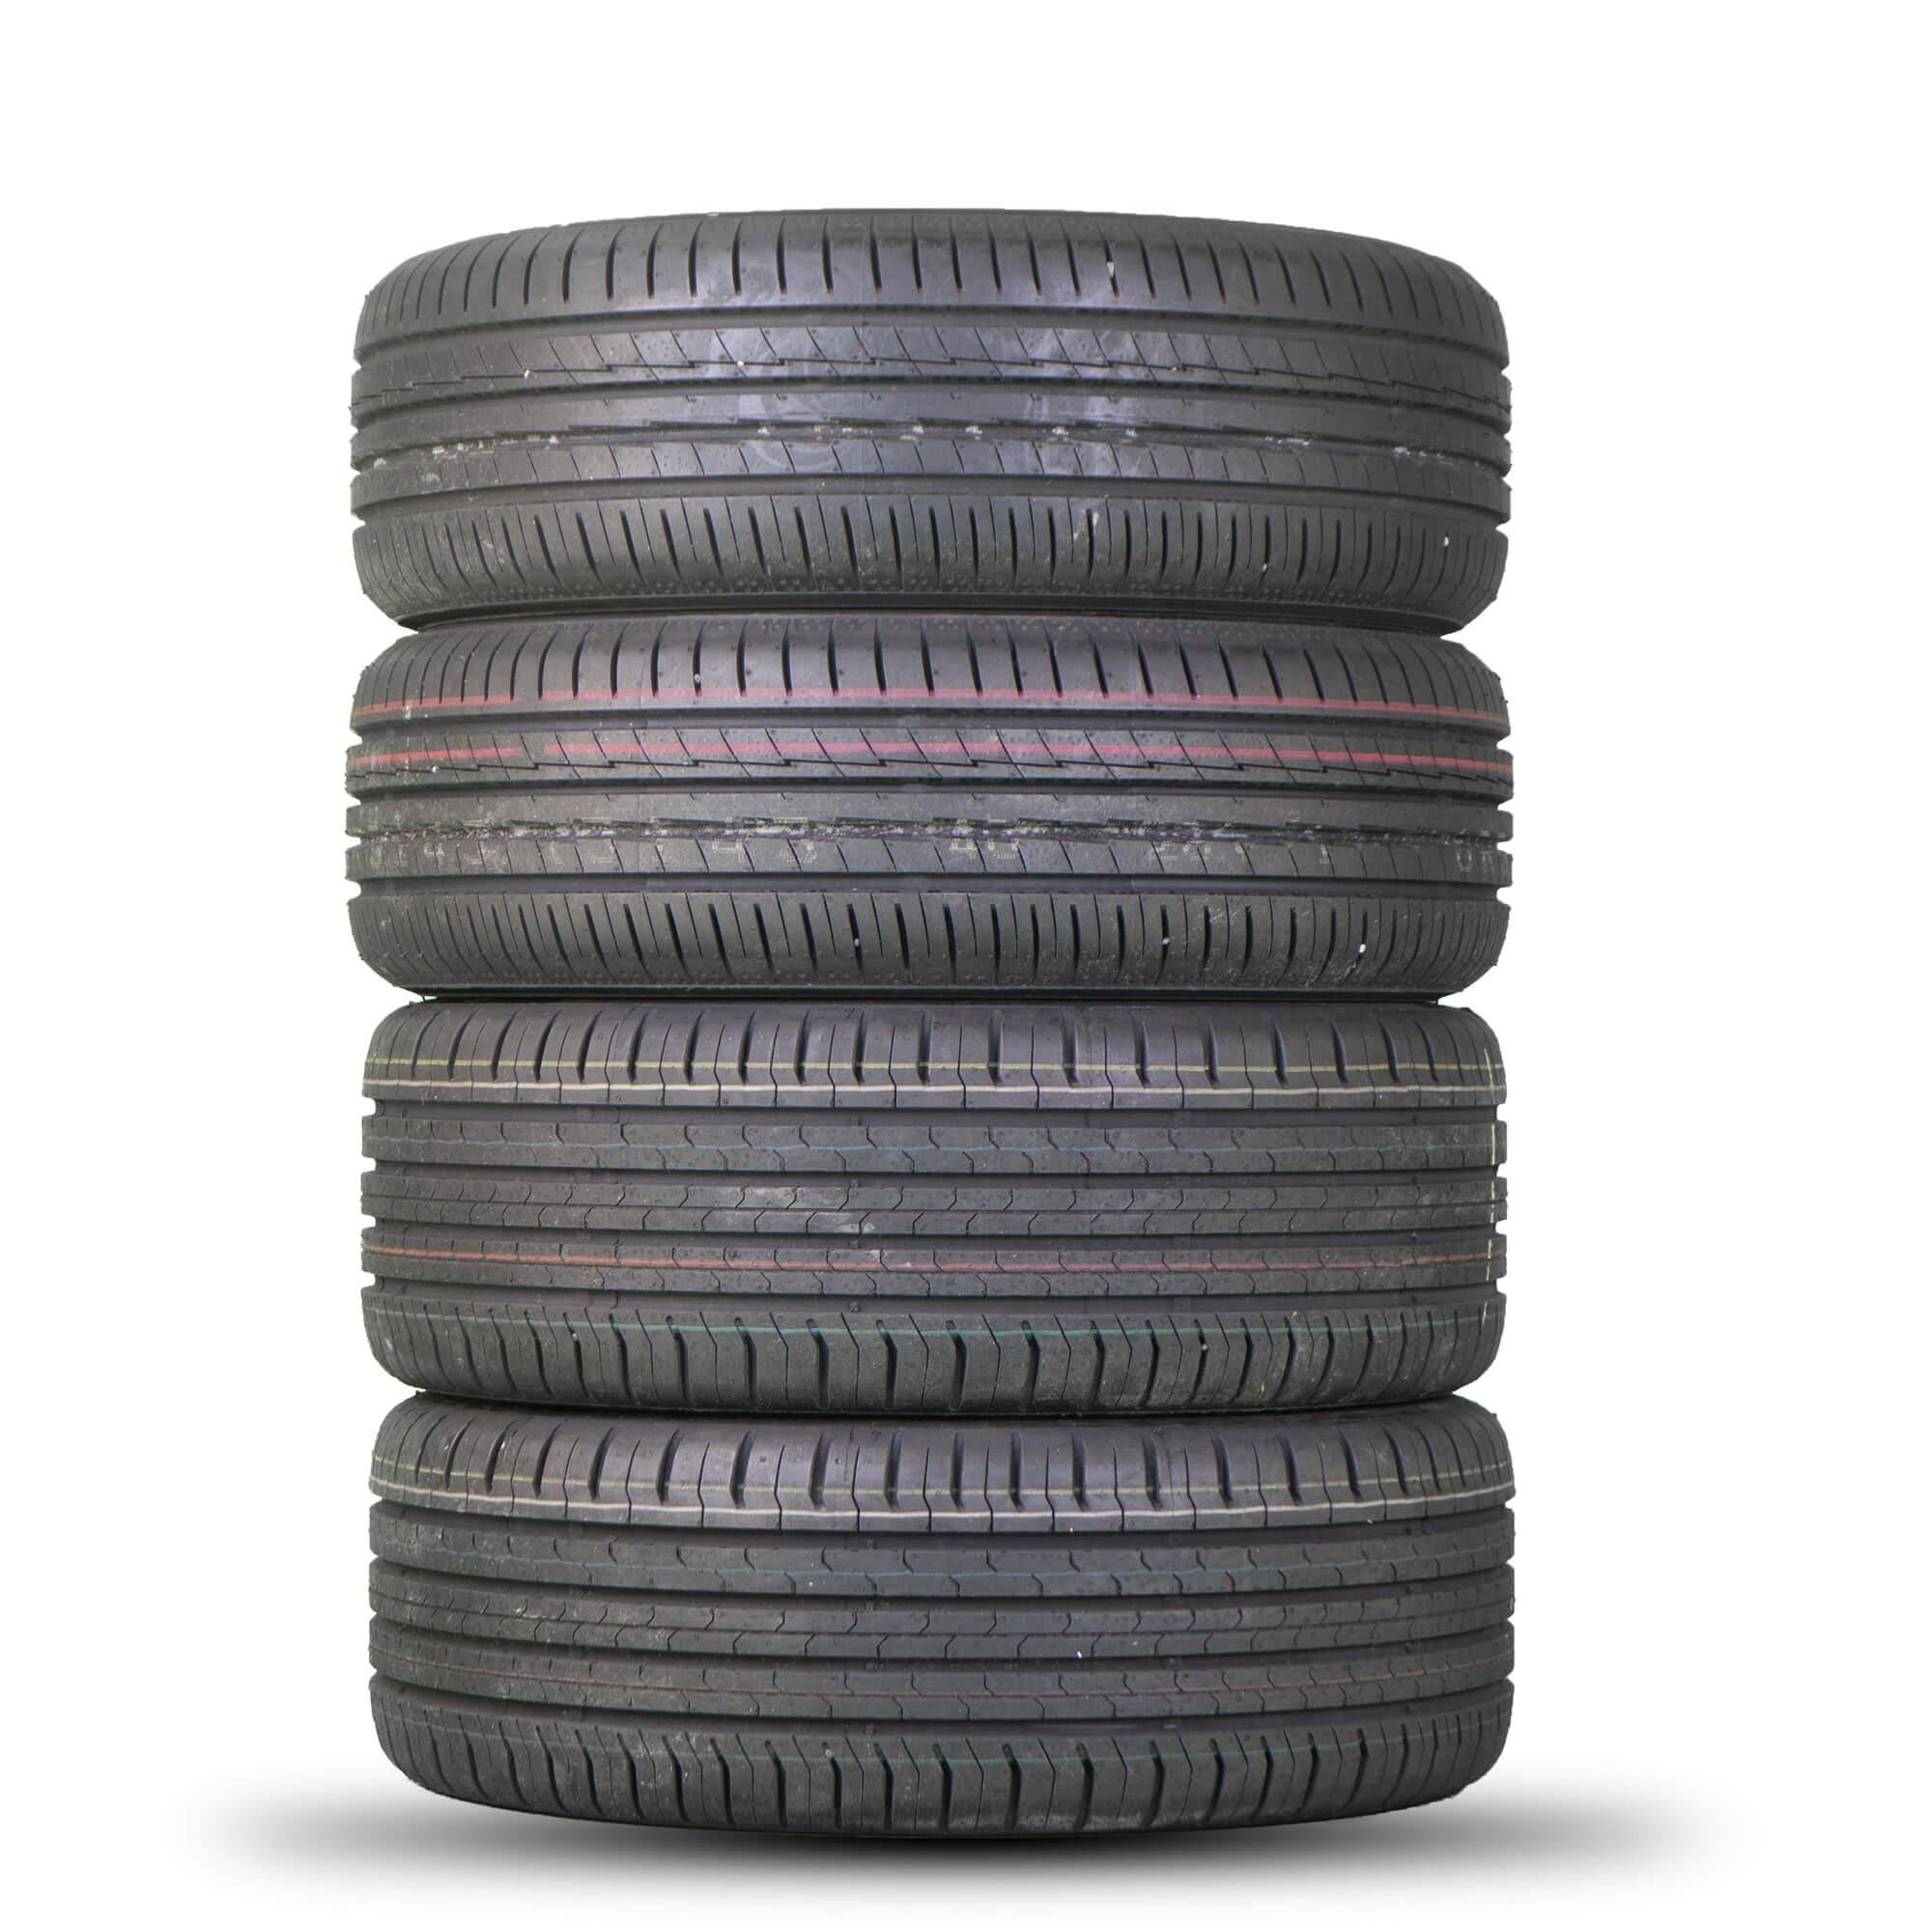 Smart como nuevo Neumáticos de verano neumáticos continental ecocontact 5 185//50 r16 81h por ejemplo